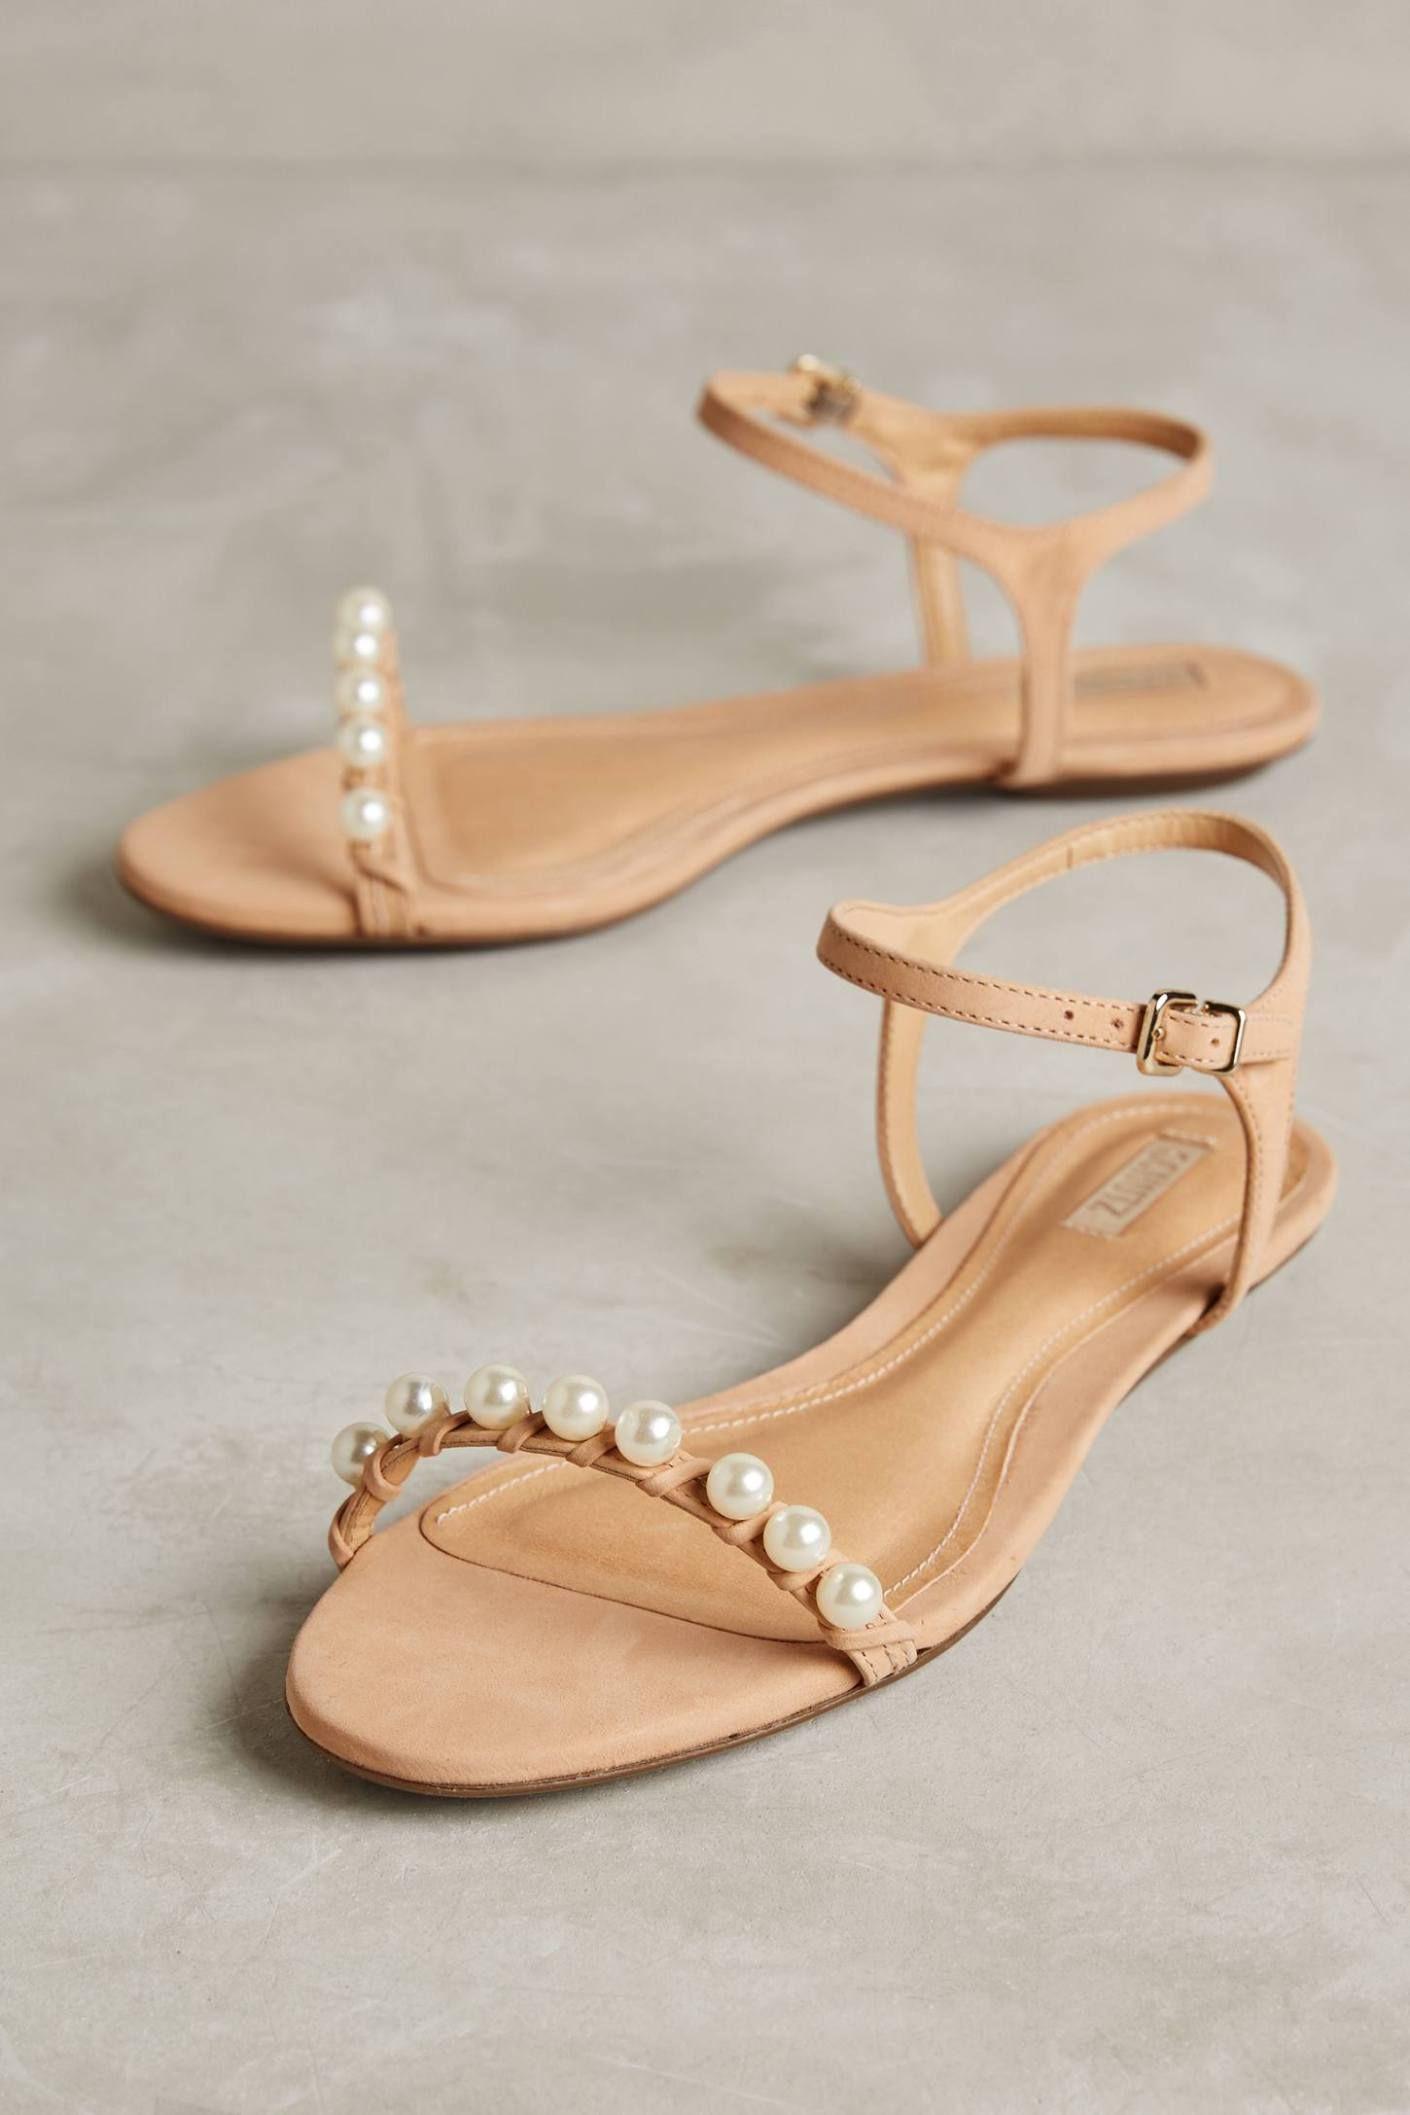 Flat sandals - Anthropologie S New Arrivals Sandals